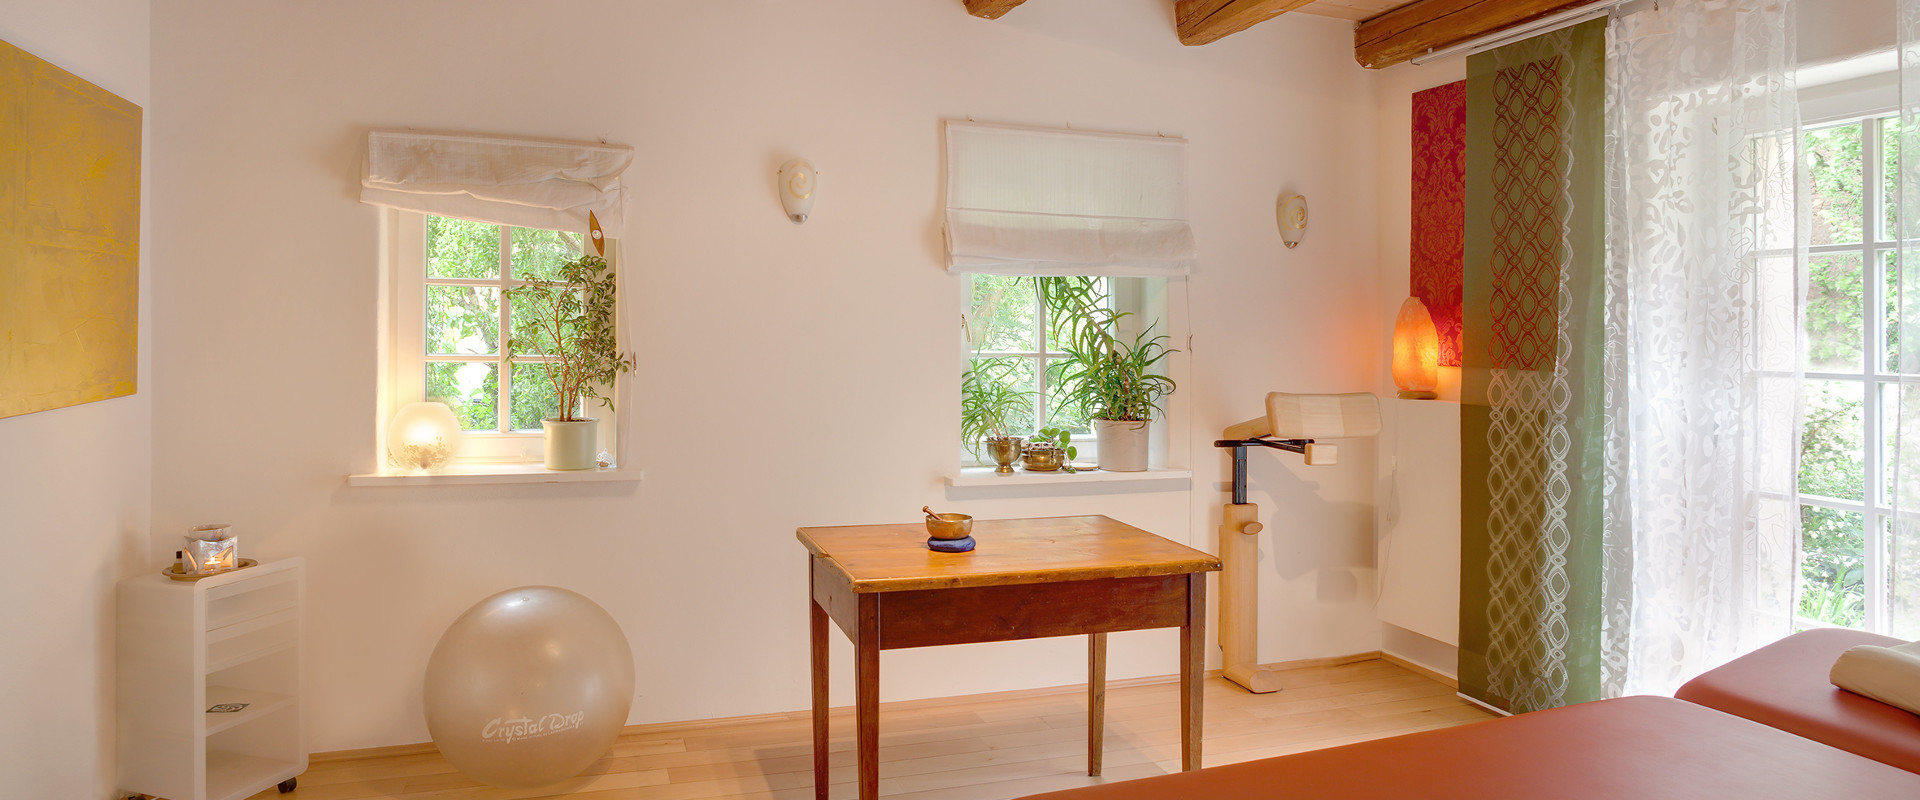 kontakt naturheilpraxis dodenh ft neukam. Black Bedroom Furniture Sets. Home Design Ideas